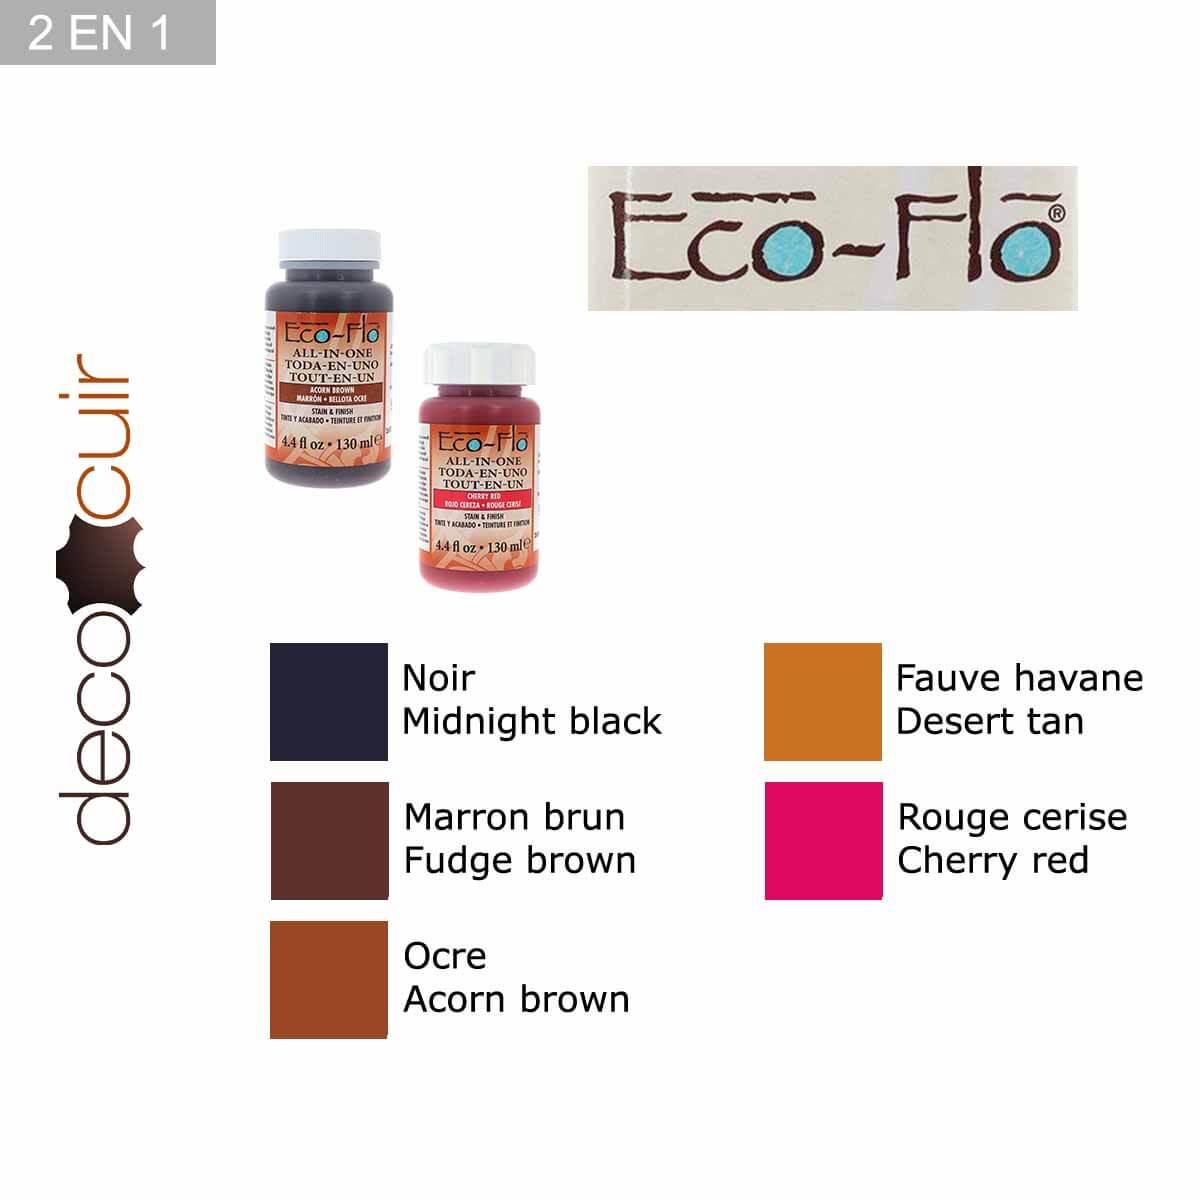 Teinture 2 en 1 pour cuir - Eco-Flo - 130ml